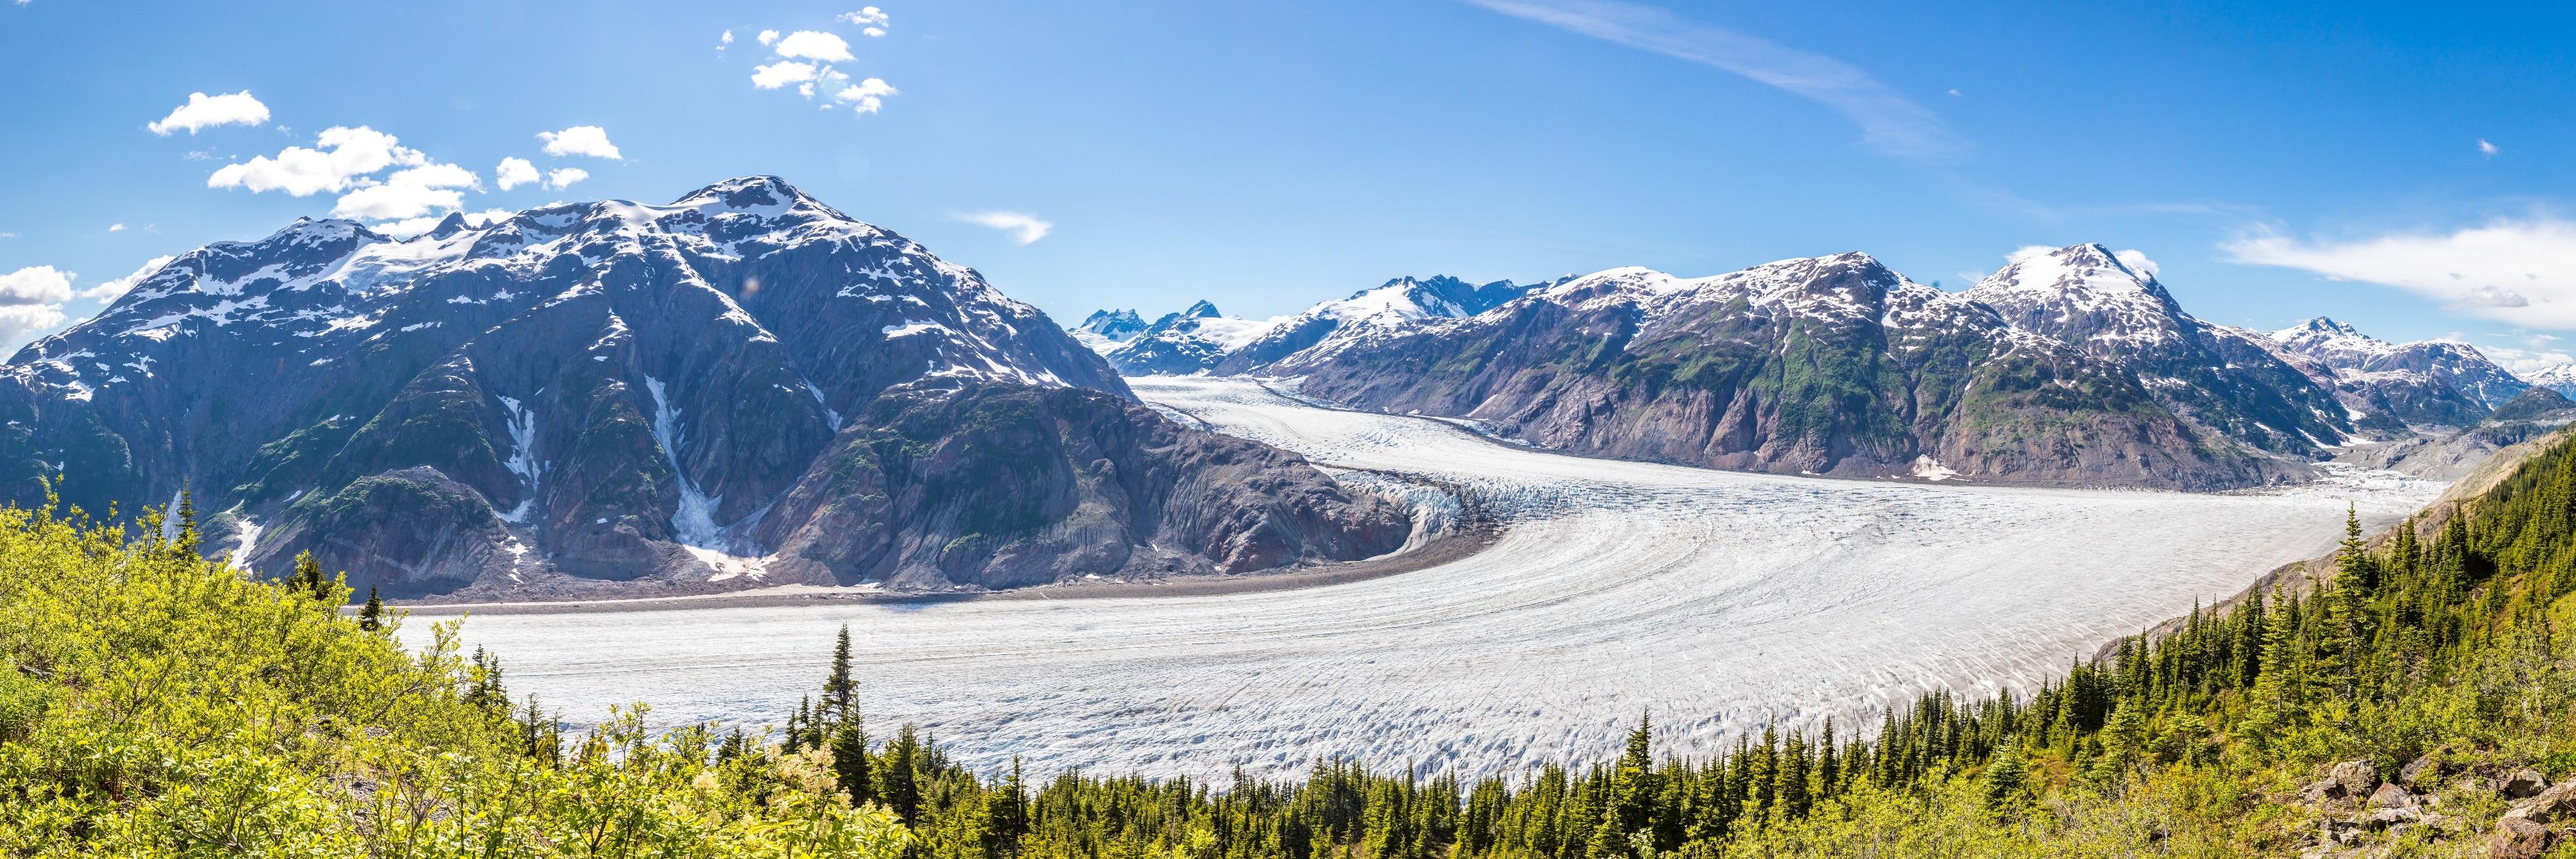 Regional District of Kitimat-Stikine, British Columbia, Canada